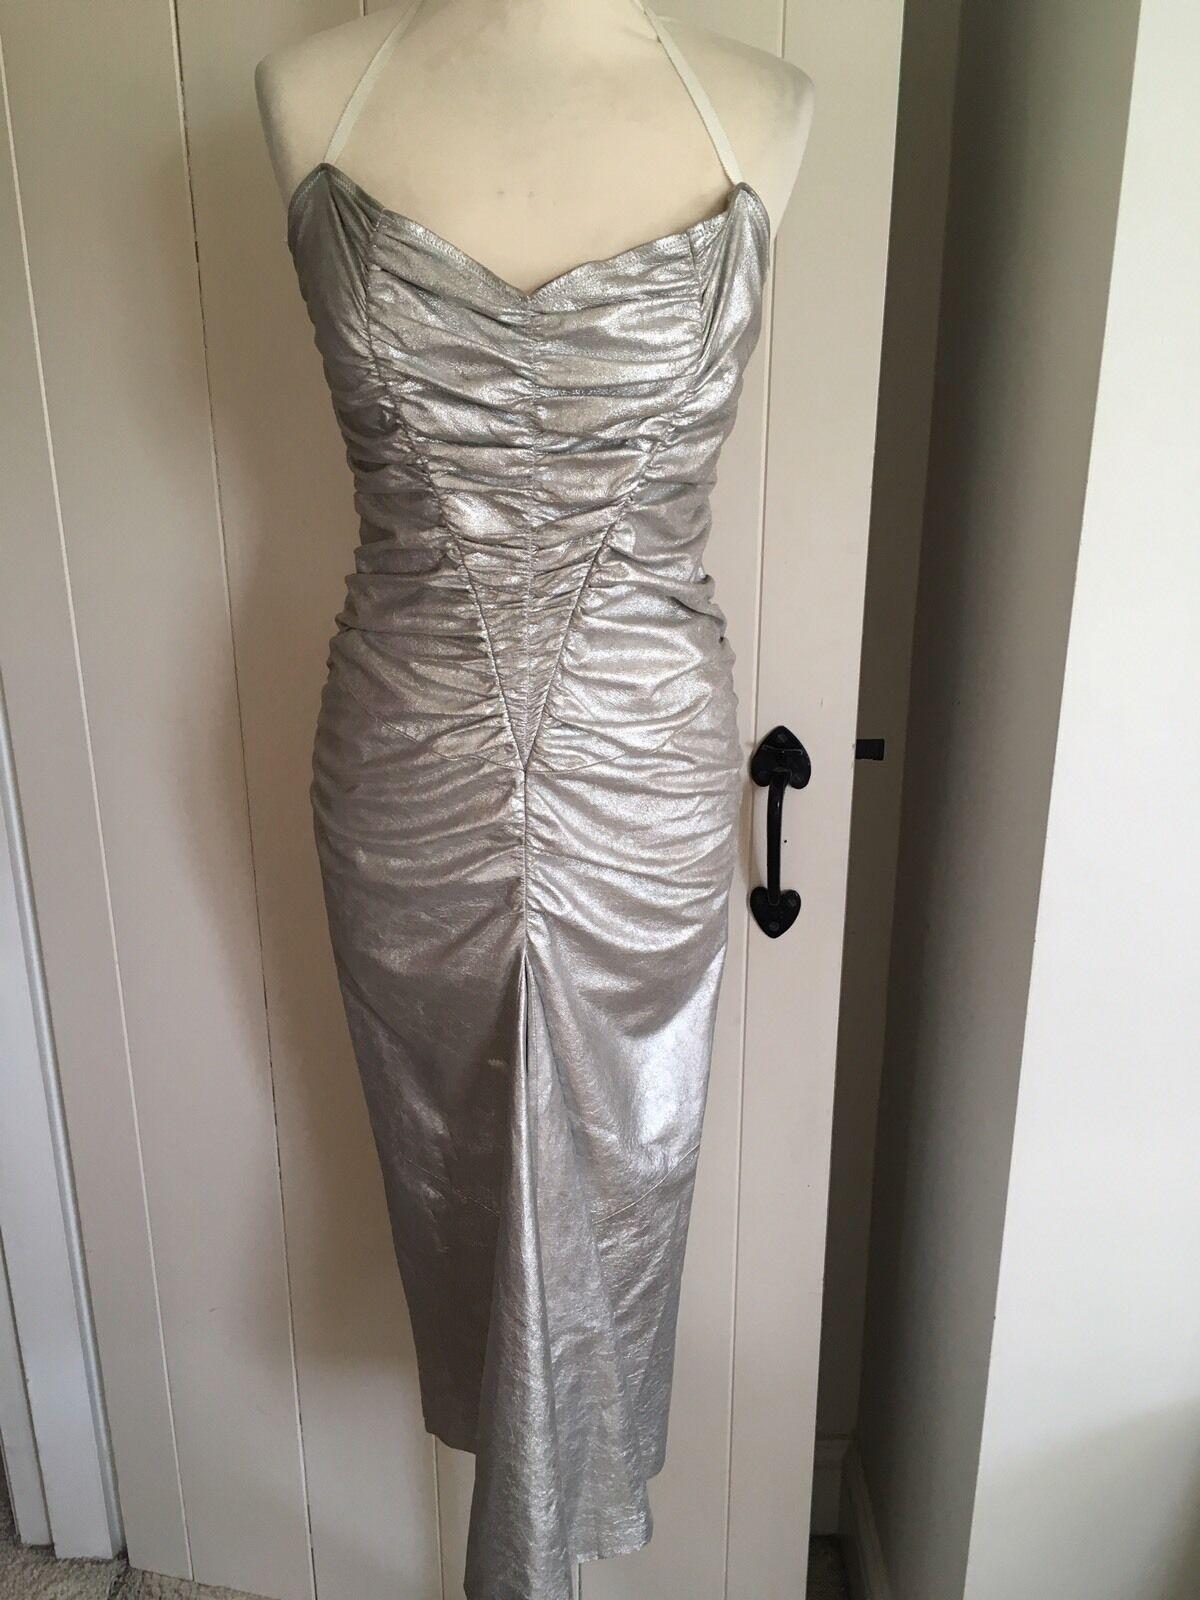 MIU Miu Vintage Stretch Abito arricciato argento argento argento in pelle 0bb39c